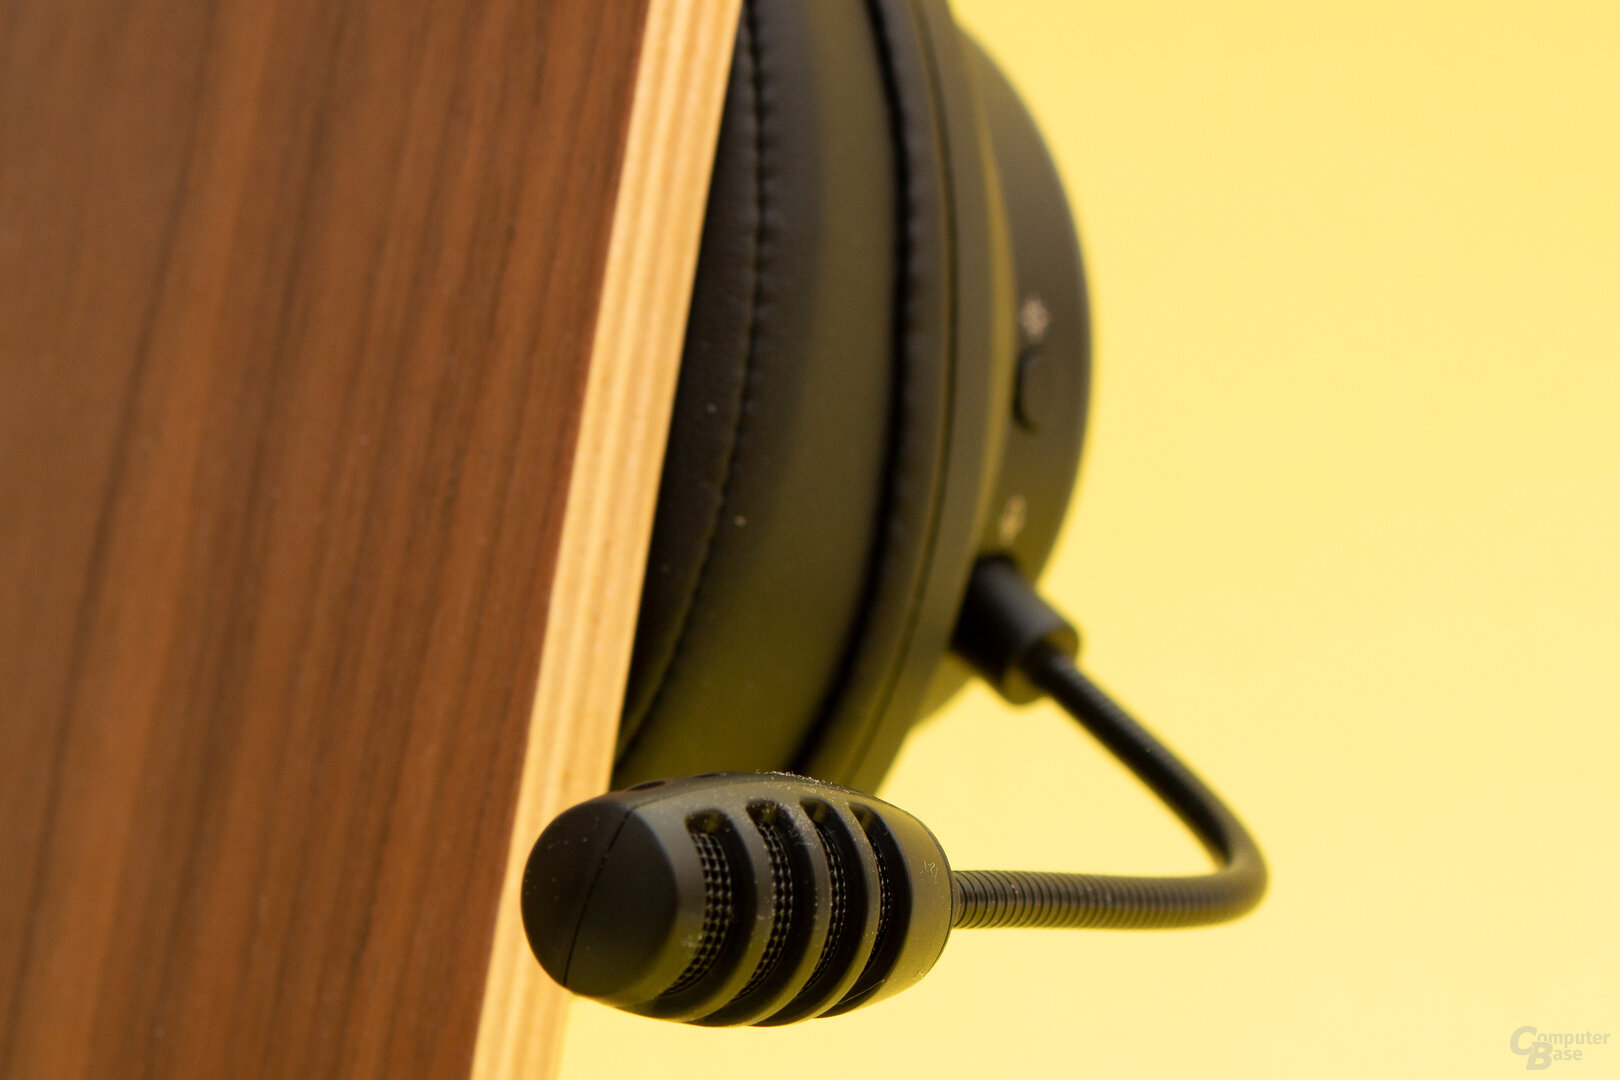 Das Mikrofon hat Creative beim SXFI Gamer stark verbessert